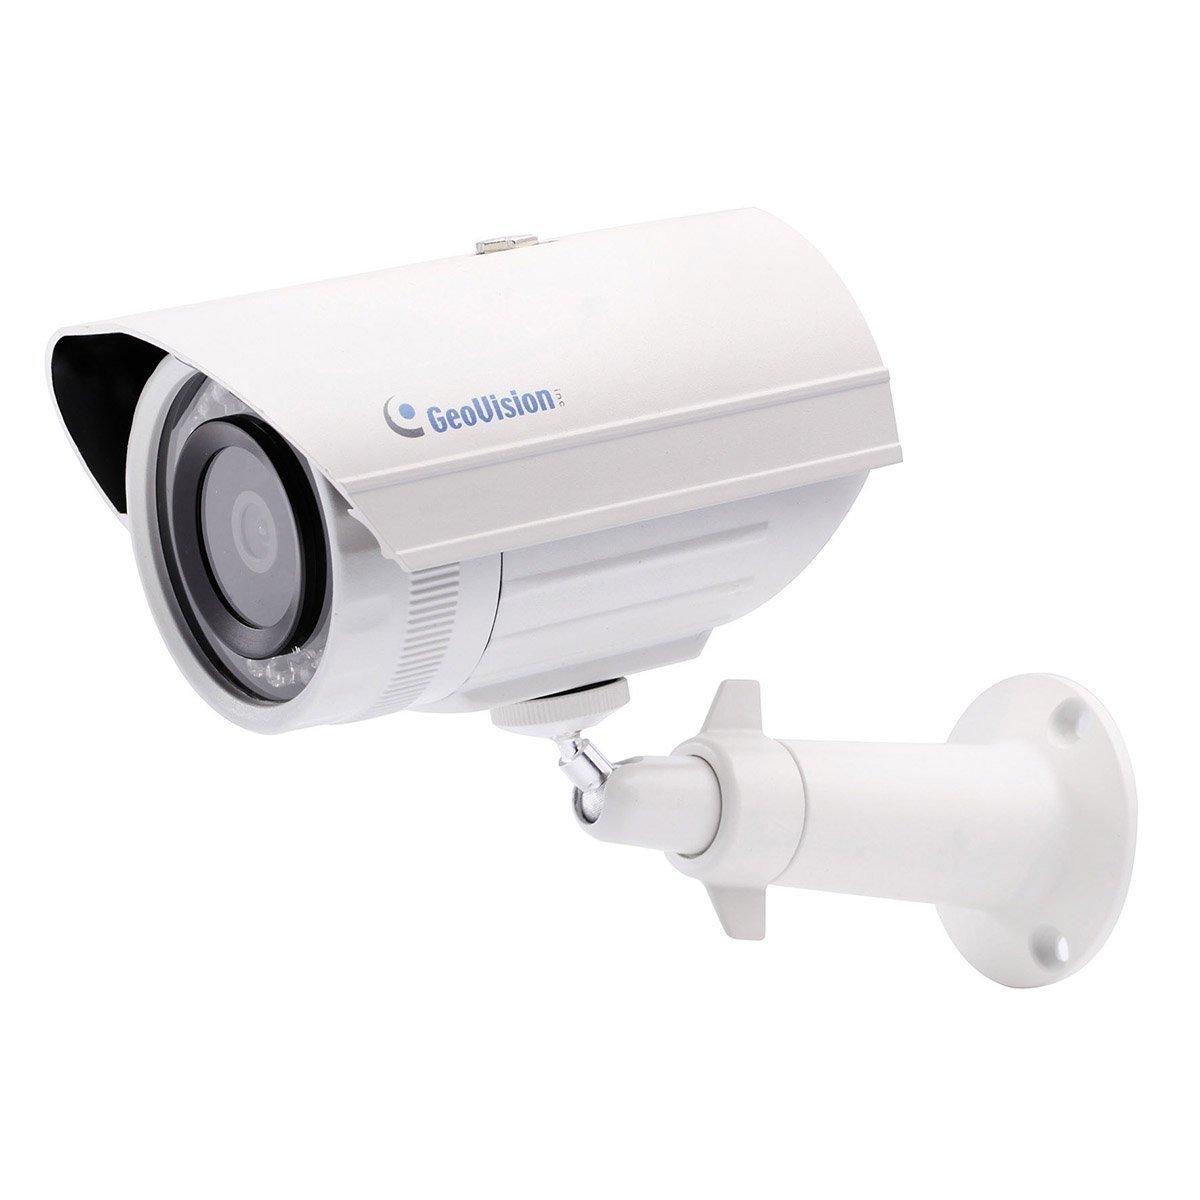 Geovision GV-EBL1100-1f   Target series 1.3MP 6mm, H.264, Low Lux, WDR, IR, IP Bullet Camera [並行輸入品] B01KDO11NM